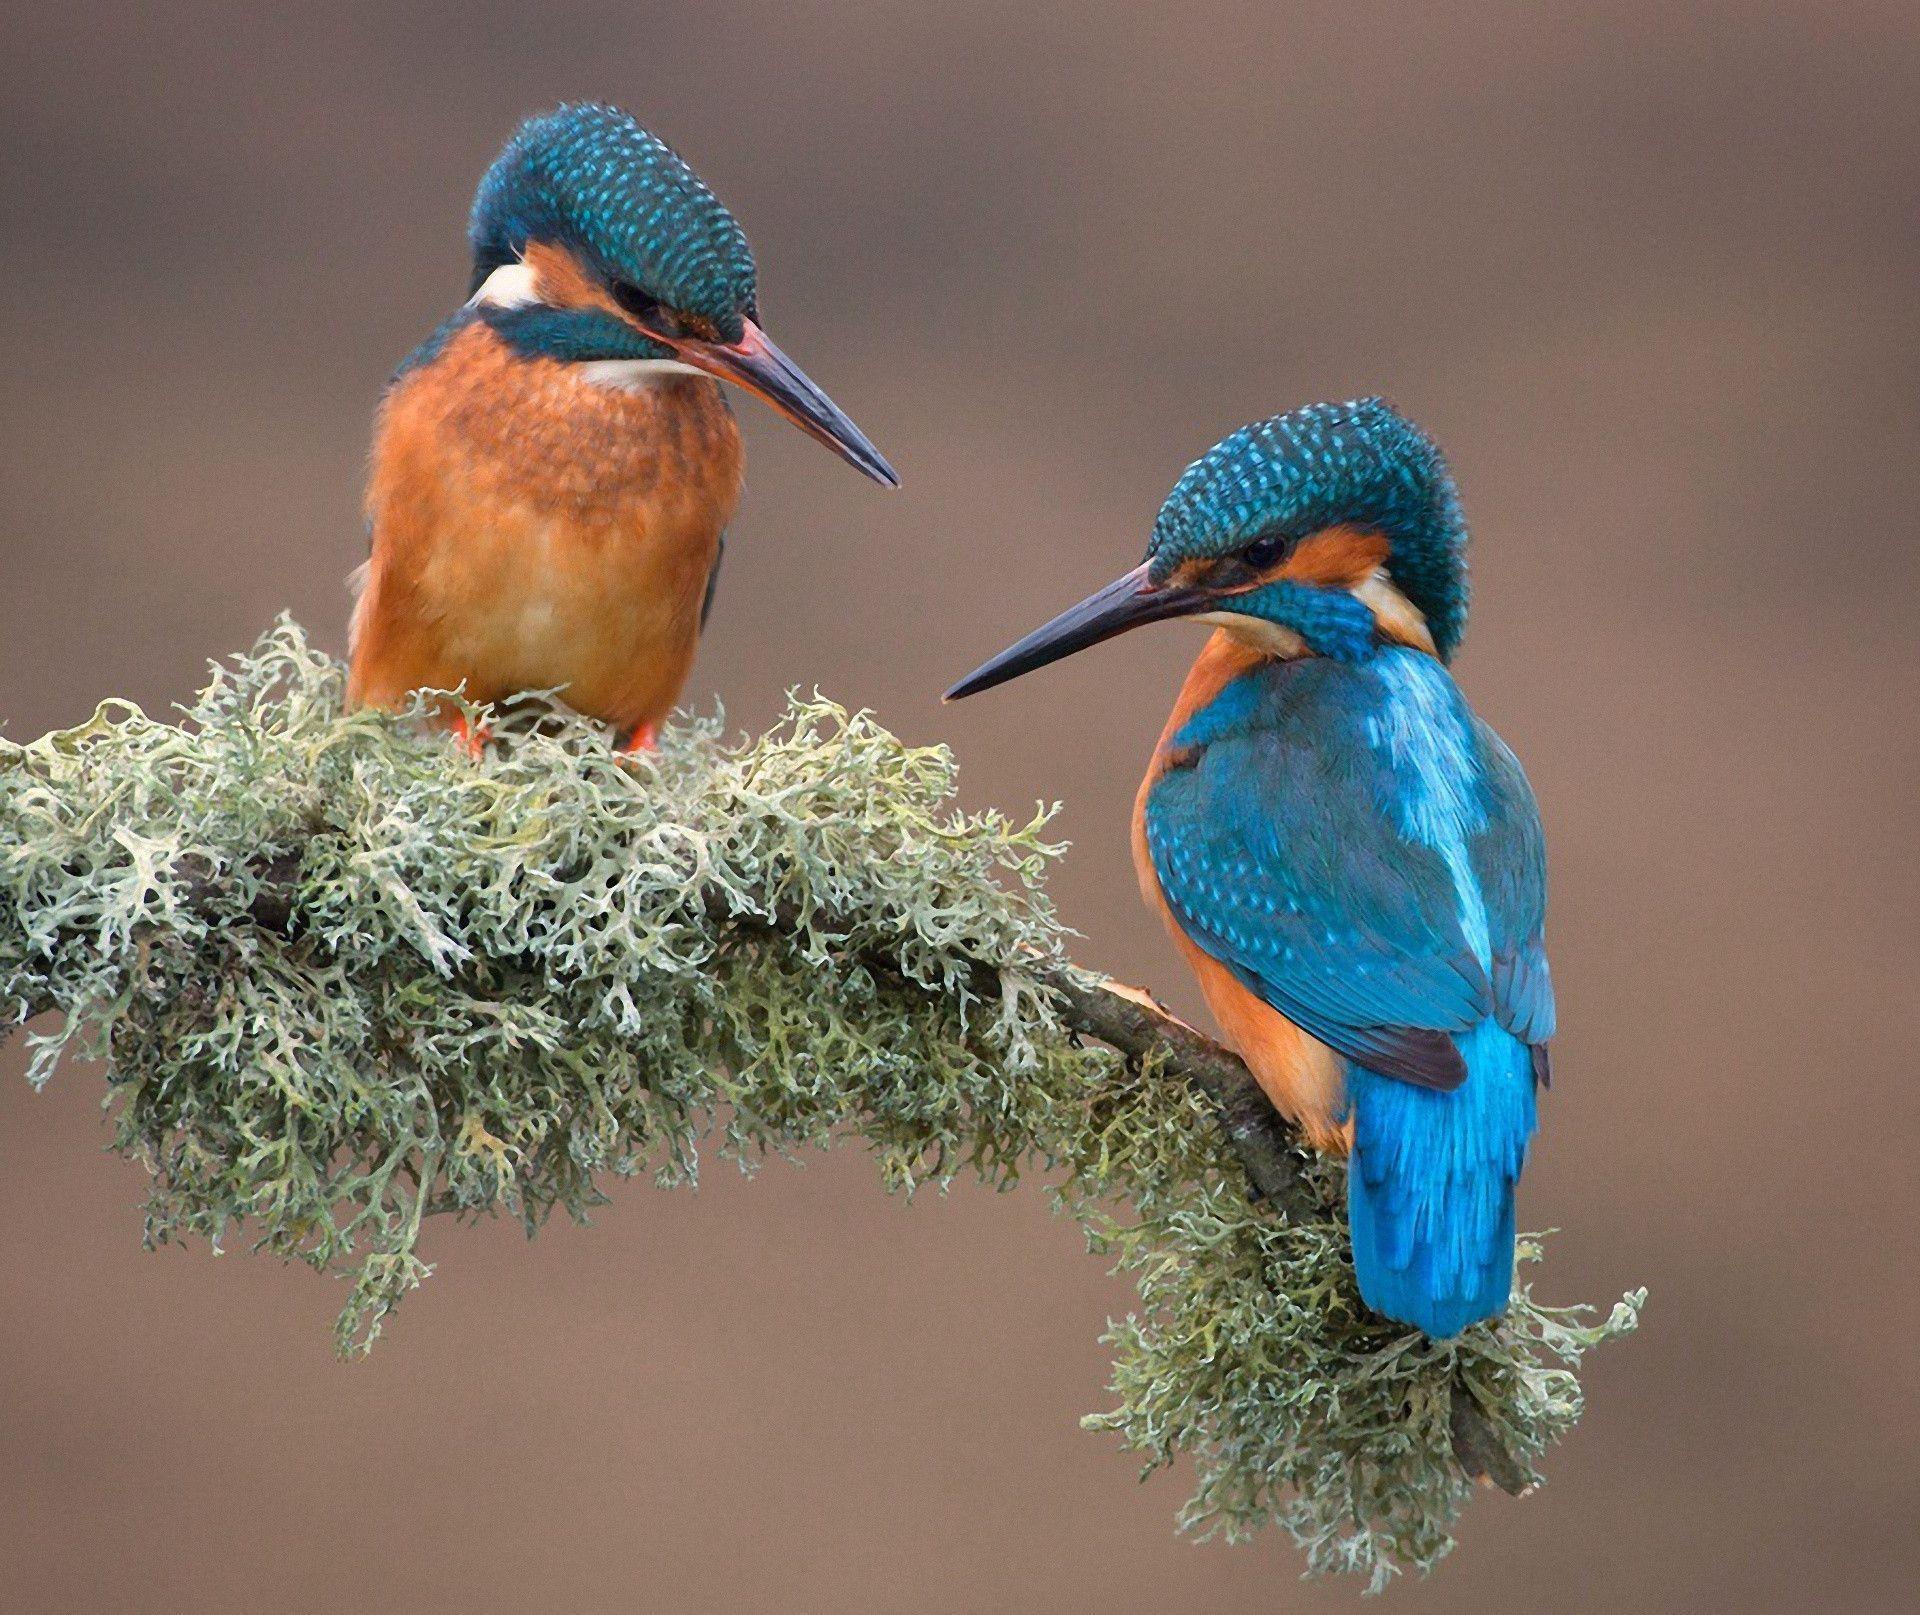 kingfisher wallpapers hd - photo #11